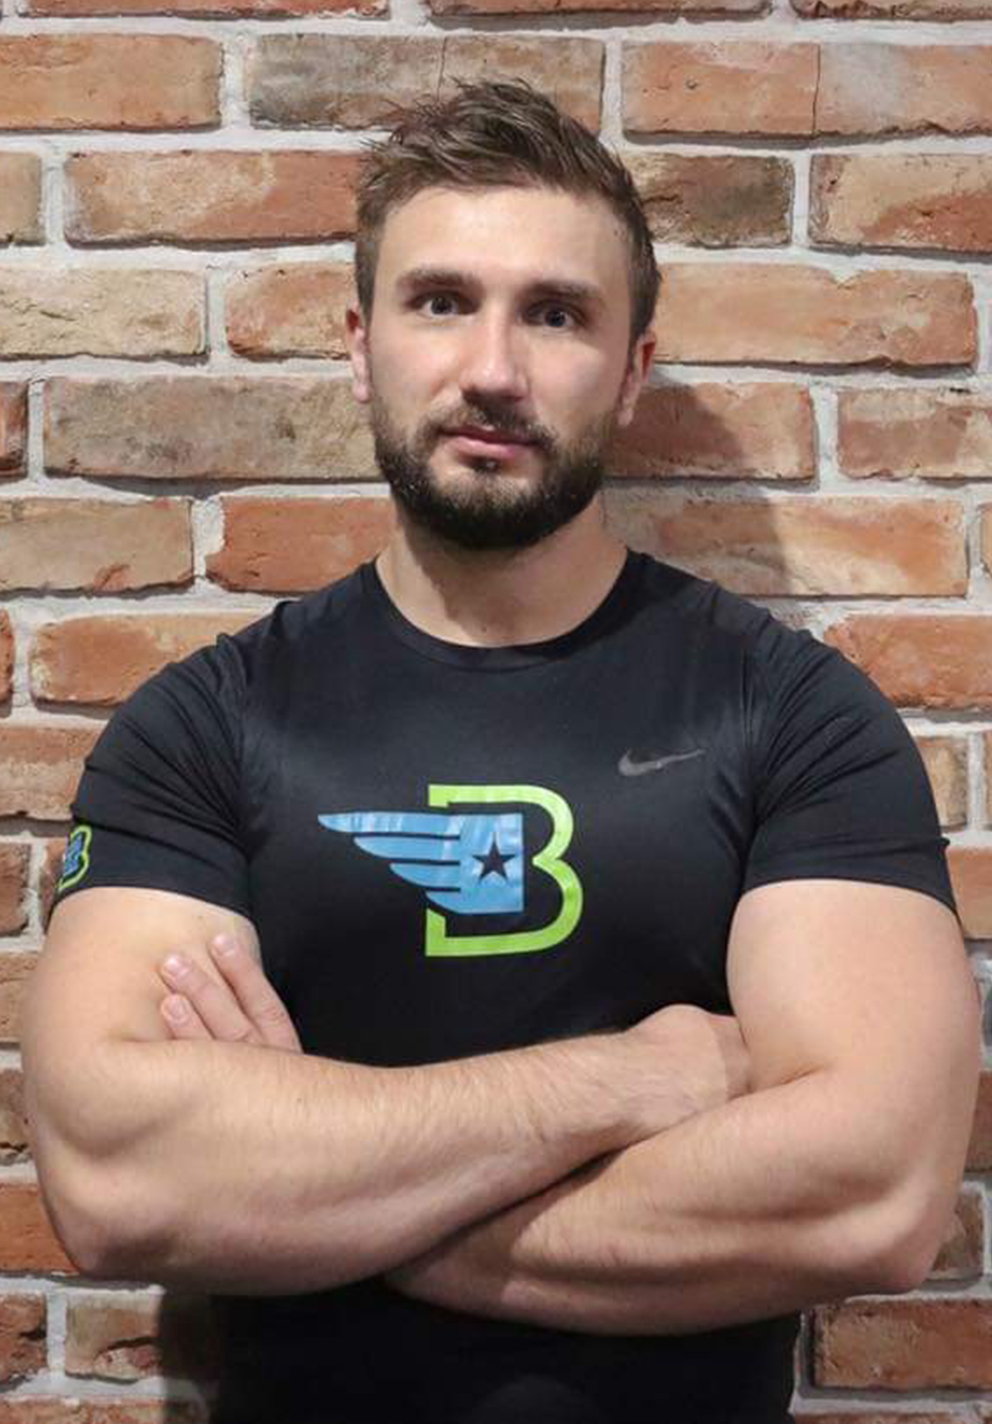 Mateusz Siudak